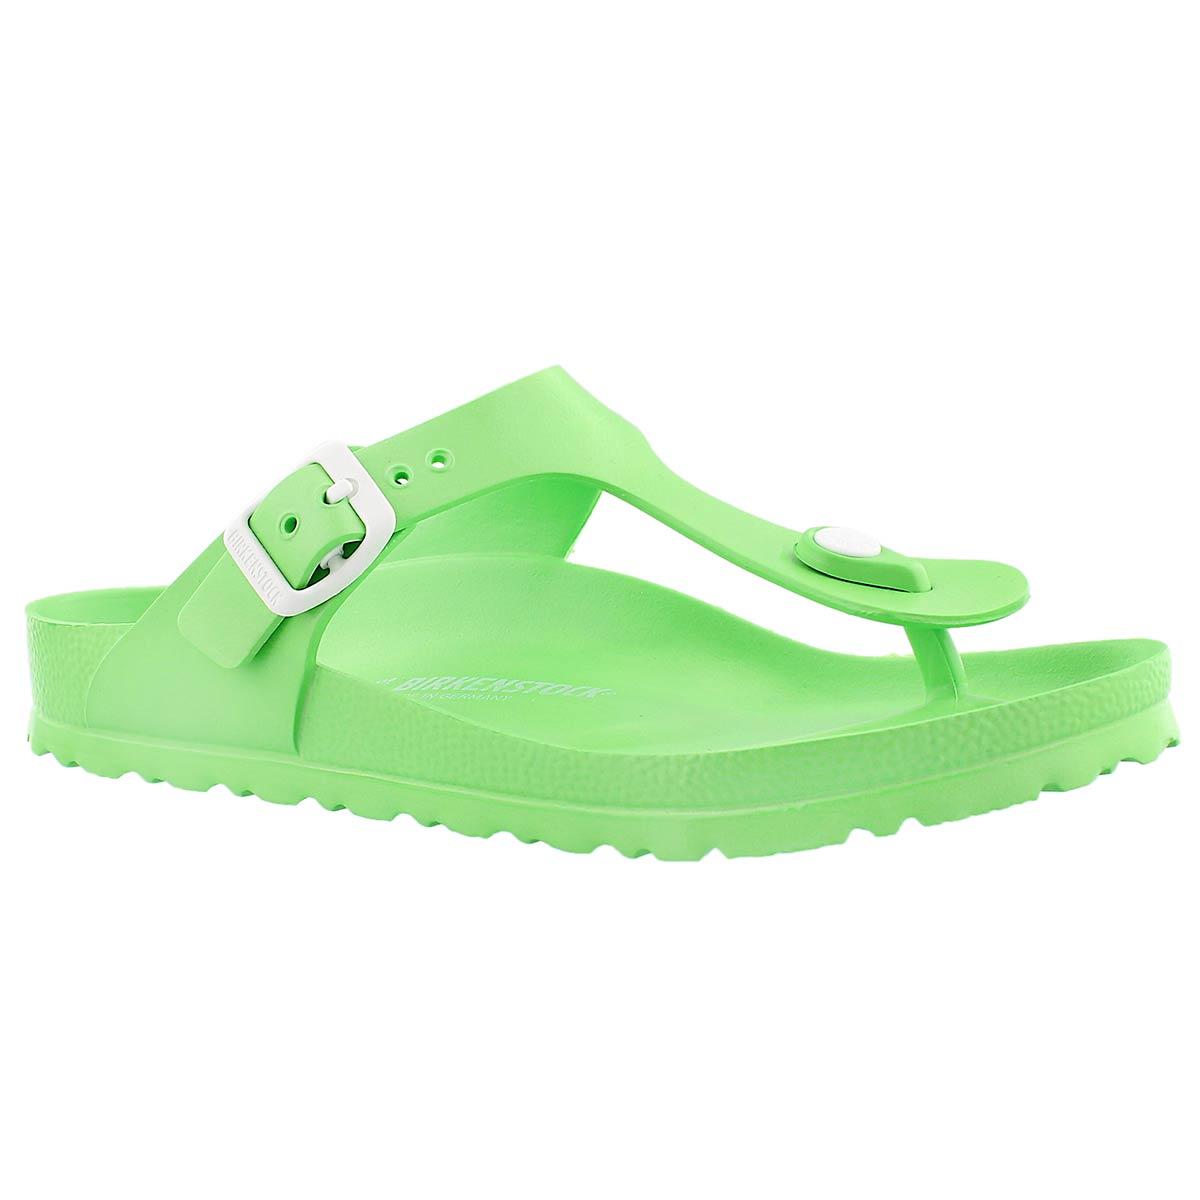 Lds Gizeh EVA neon green thong sandal